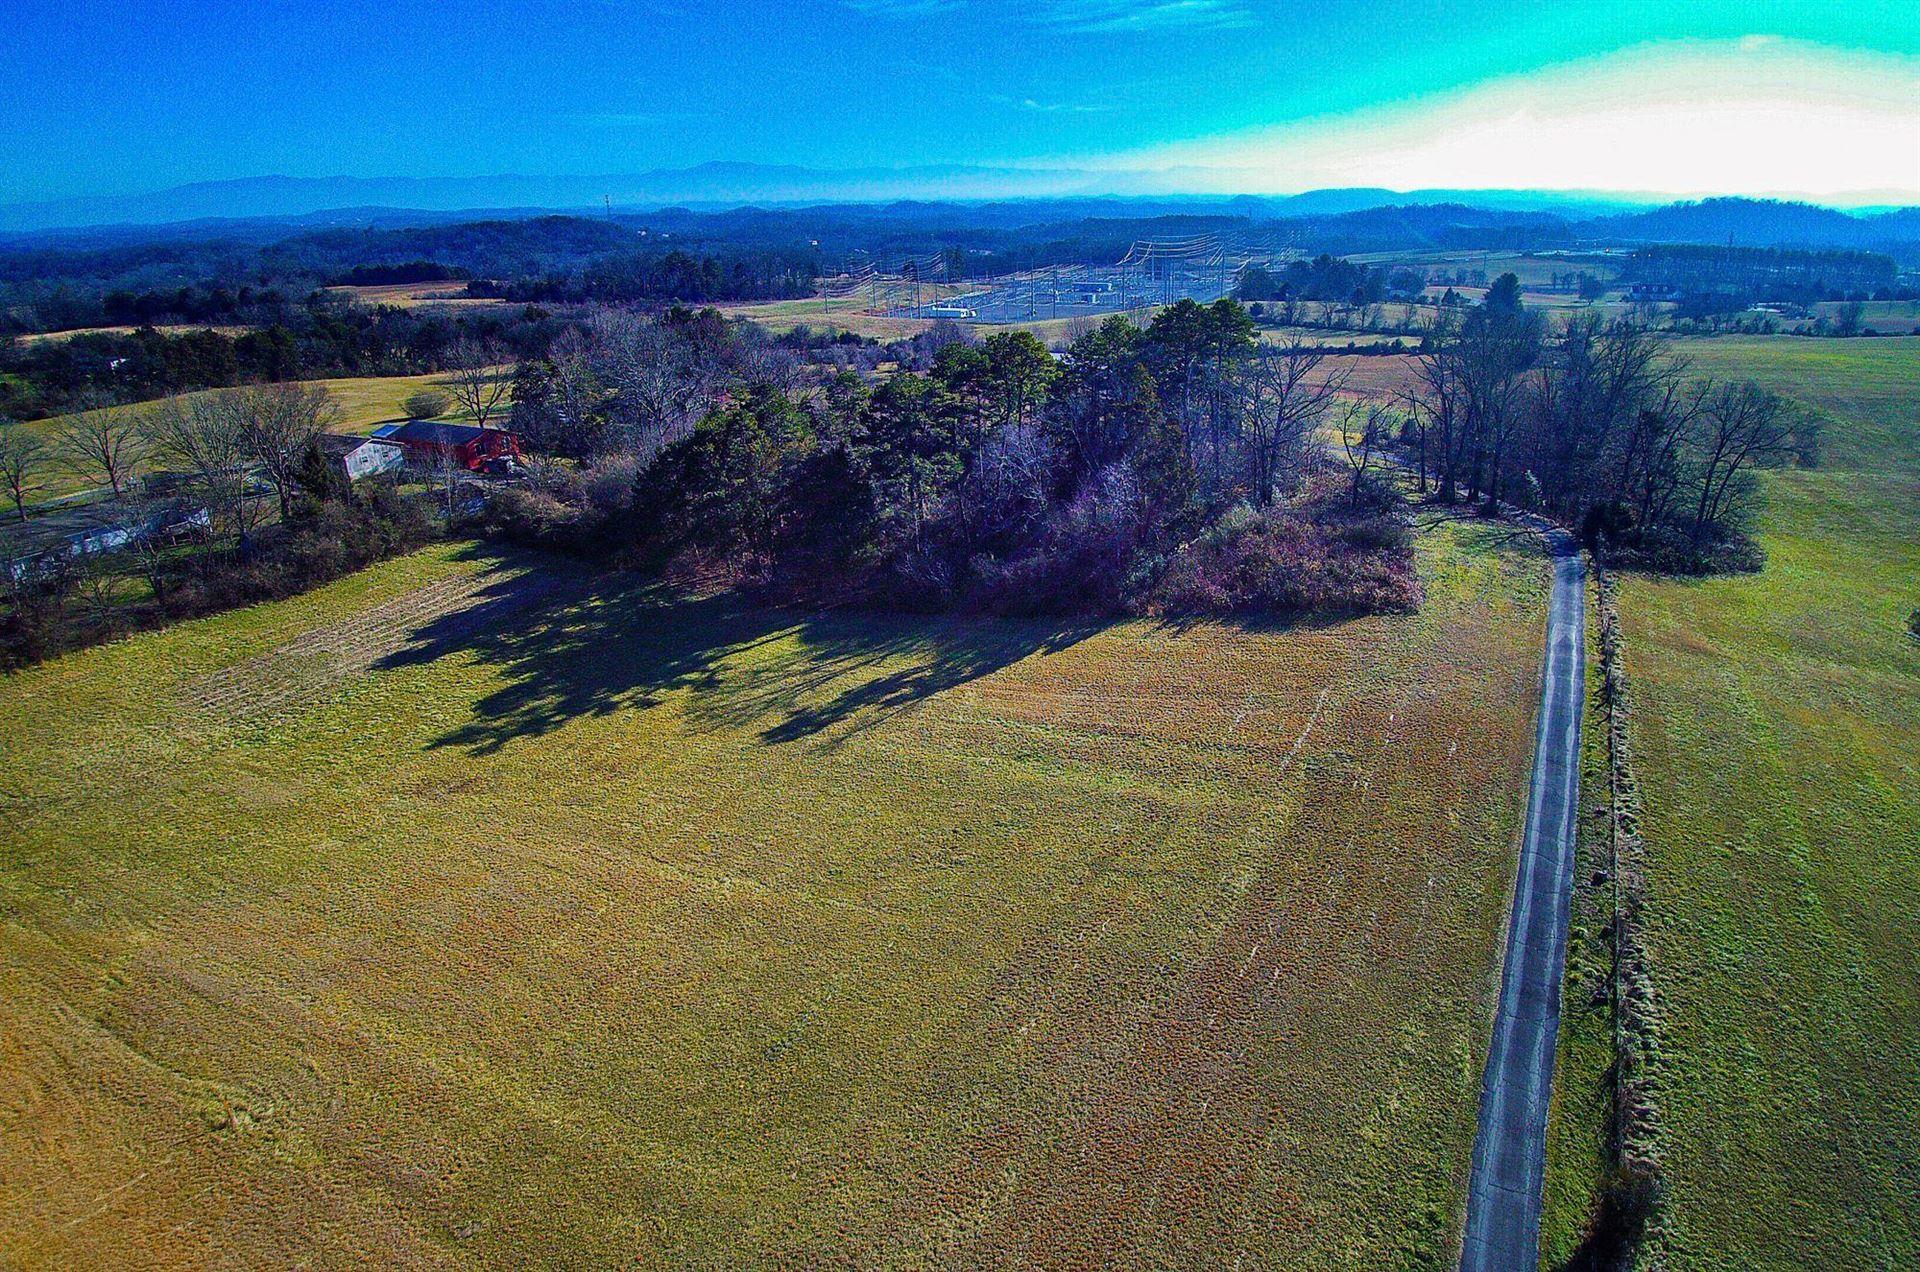 Photo of S Carter School Rd, Strawberry Plains, TN 37871 (MLS # 1140211)